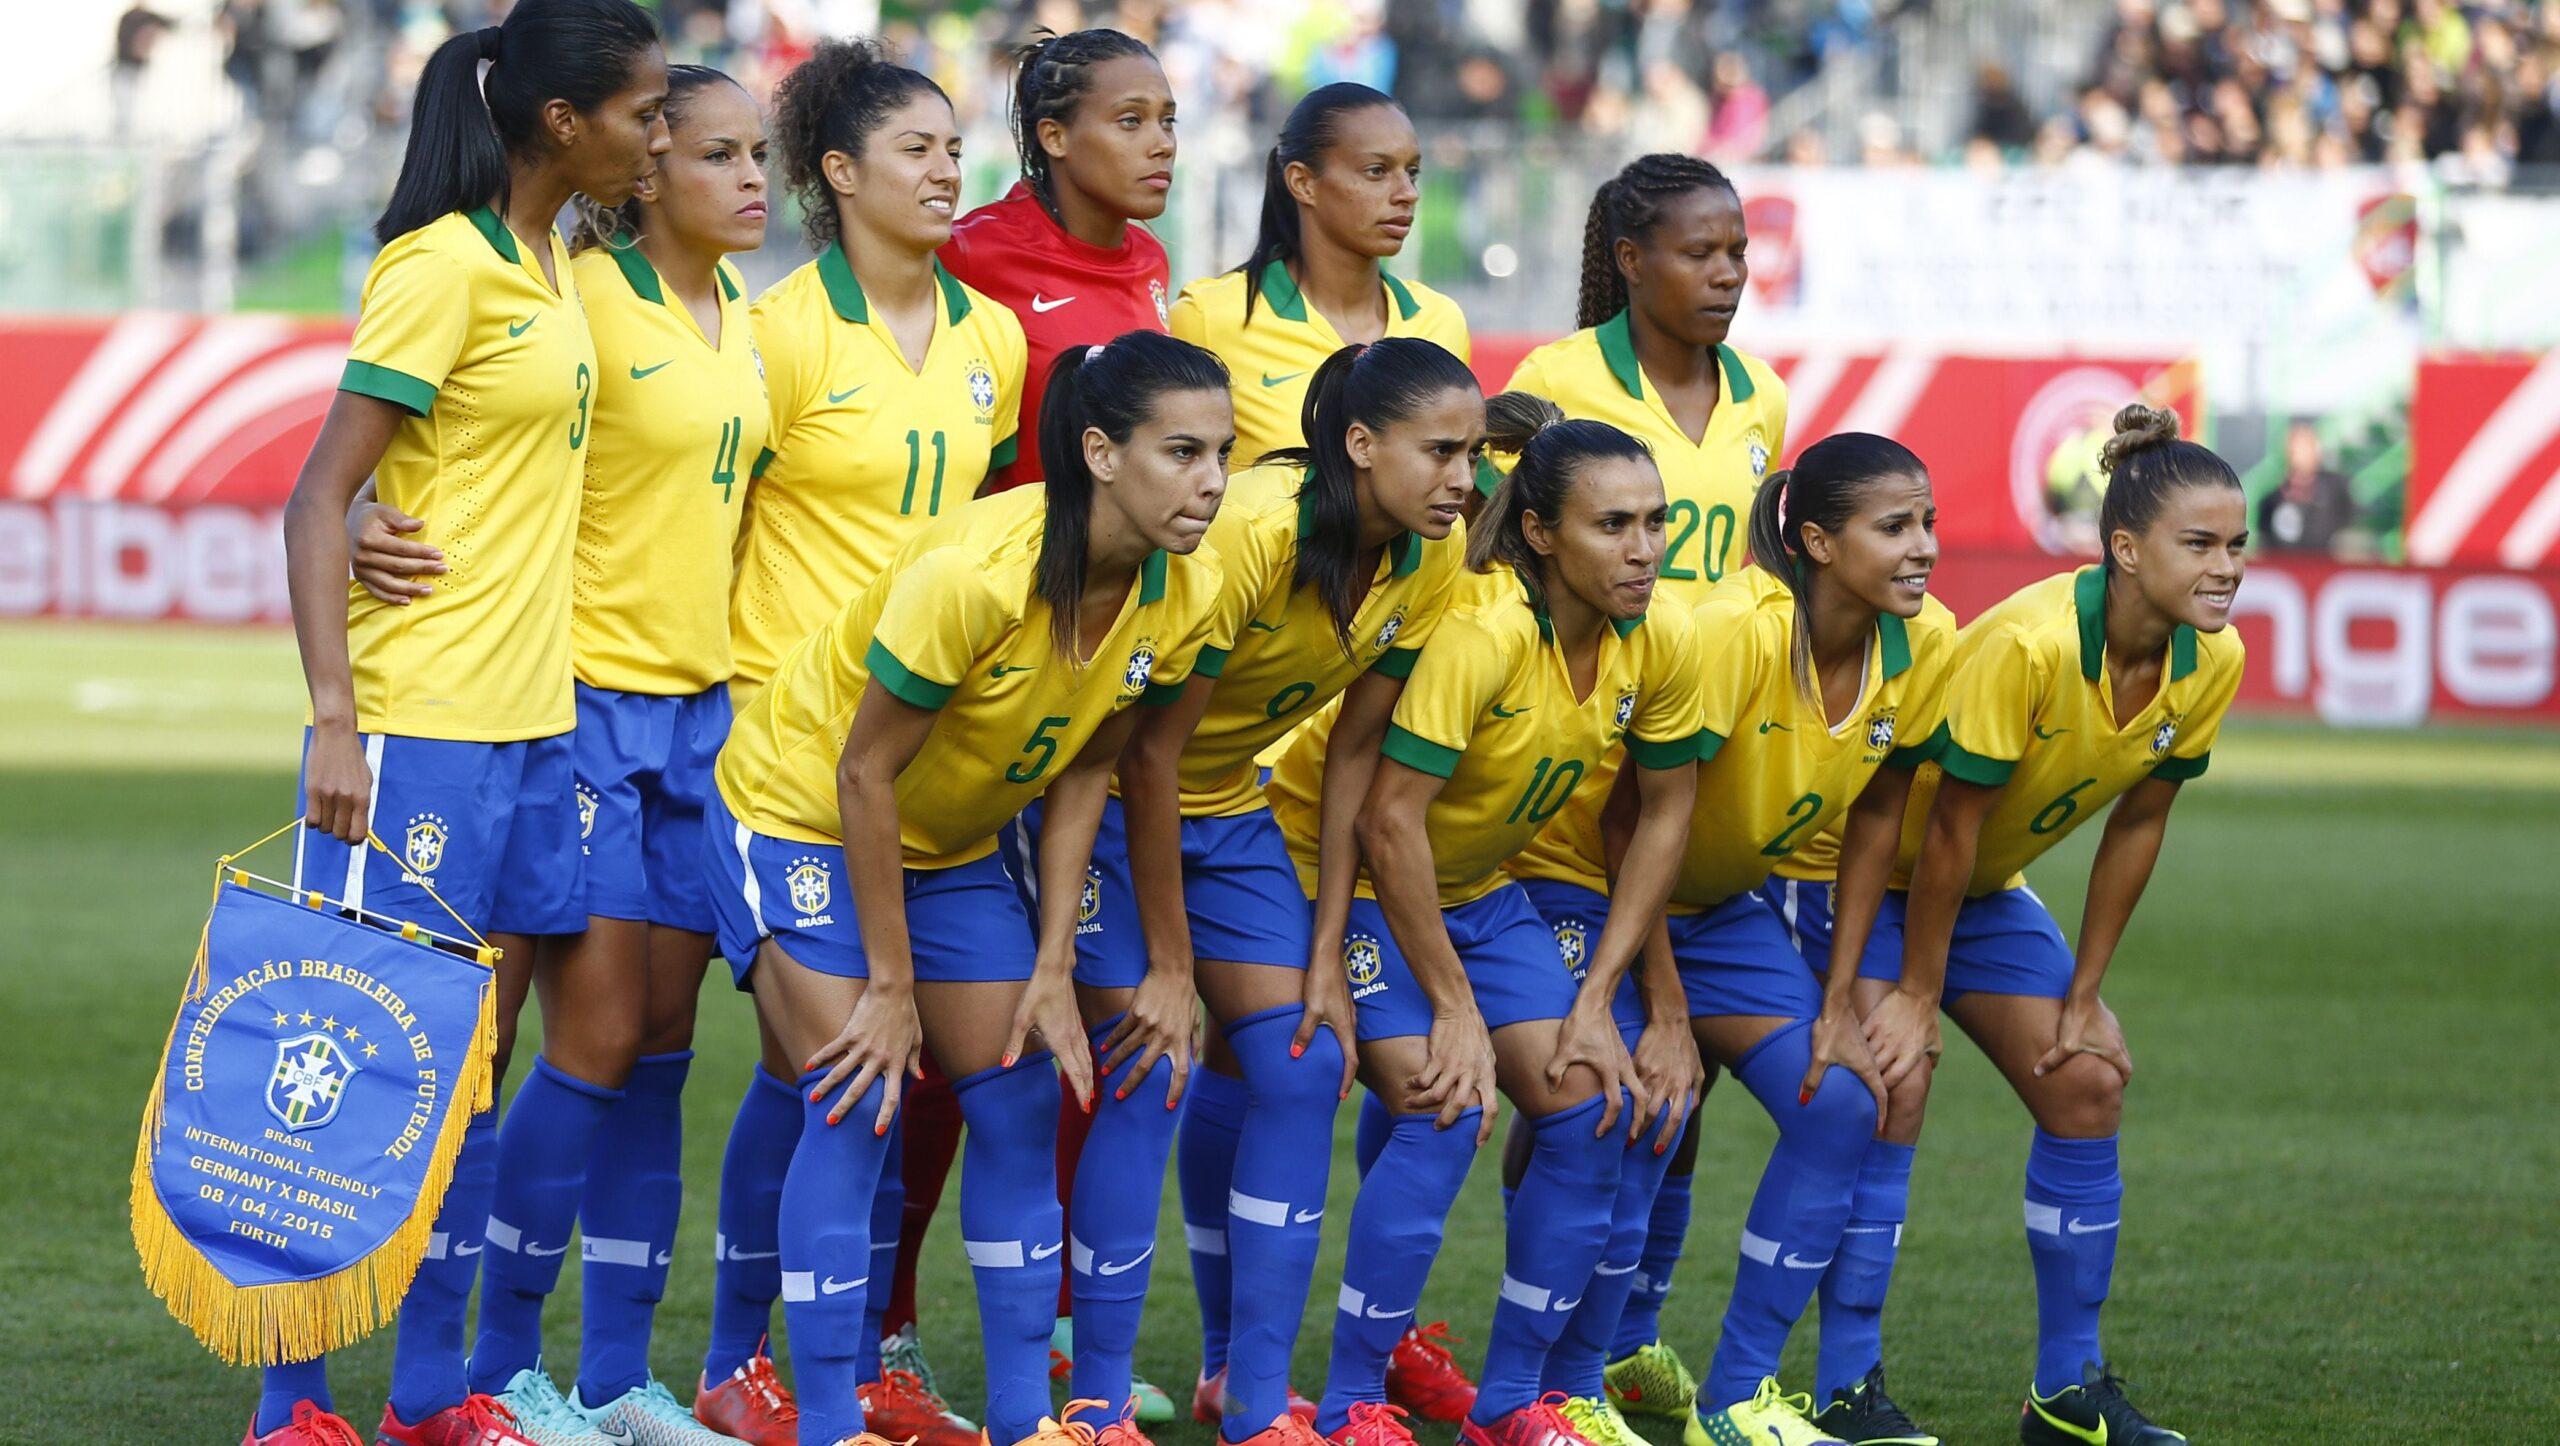 The women's football